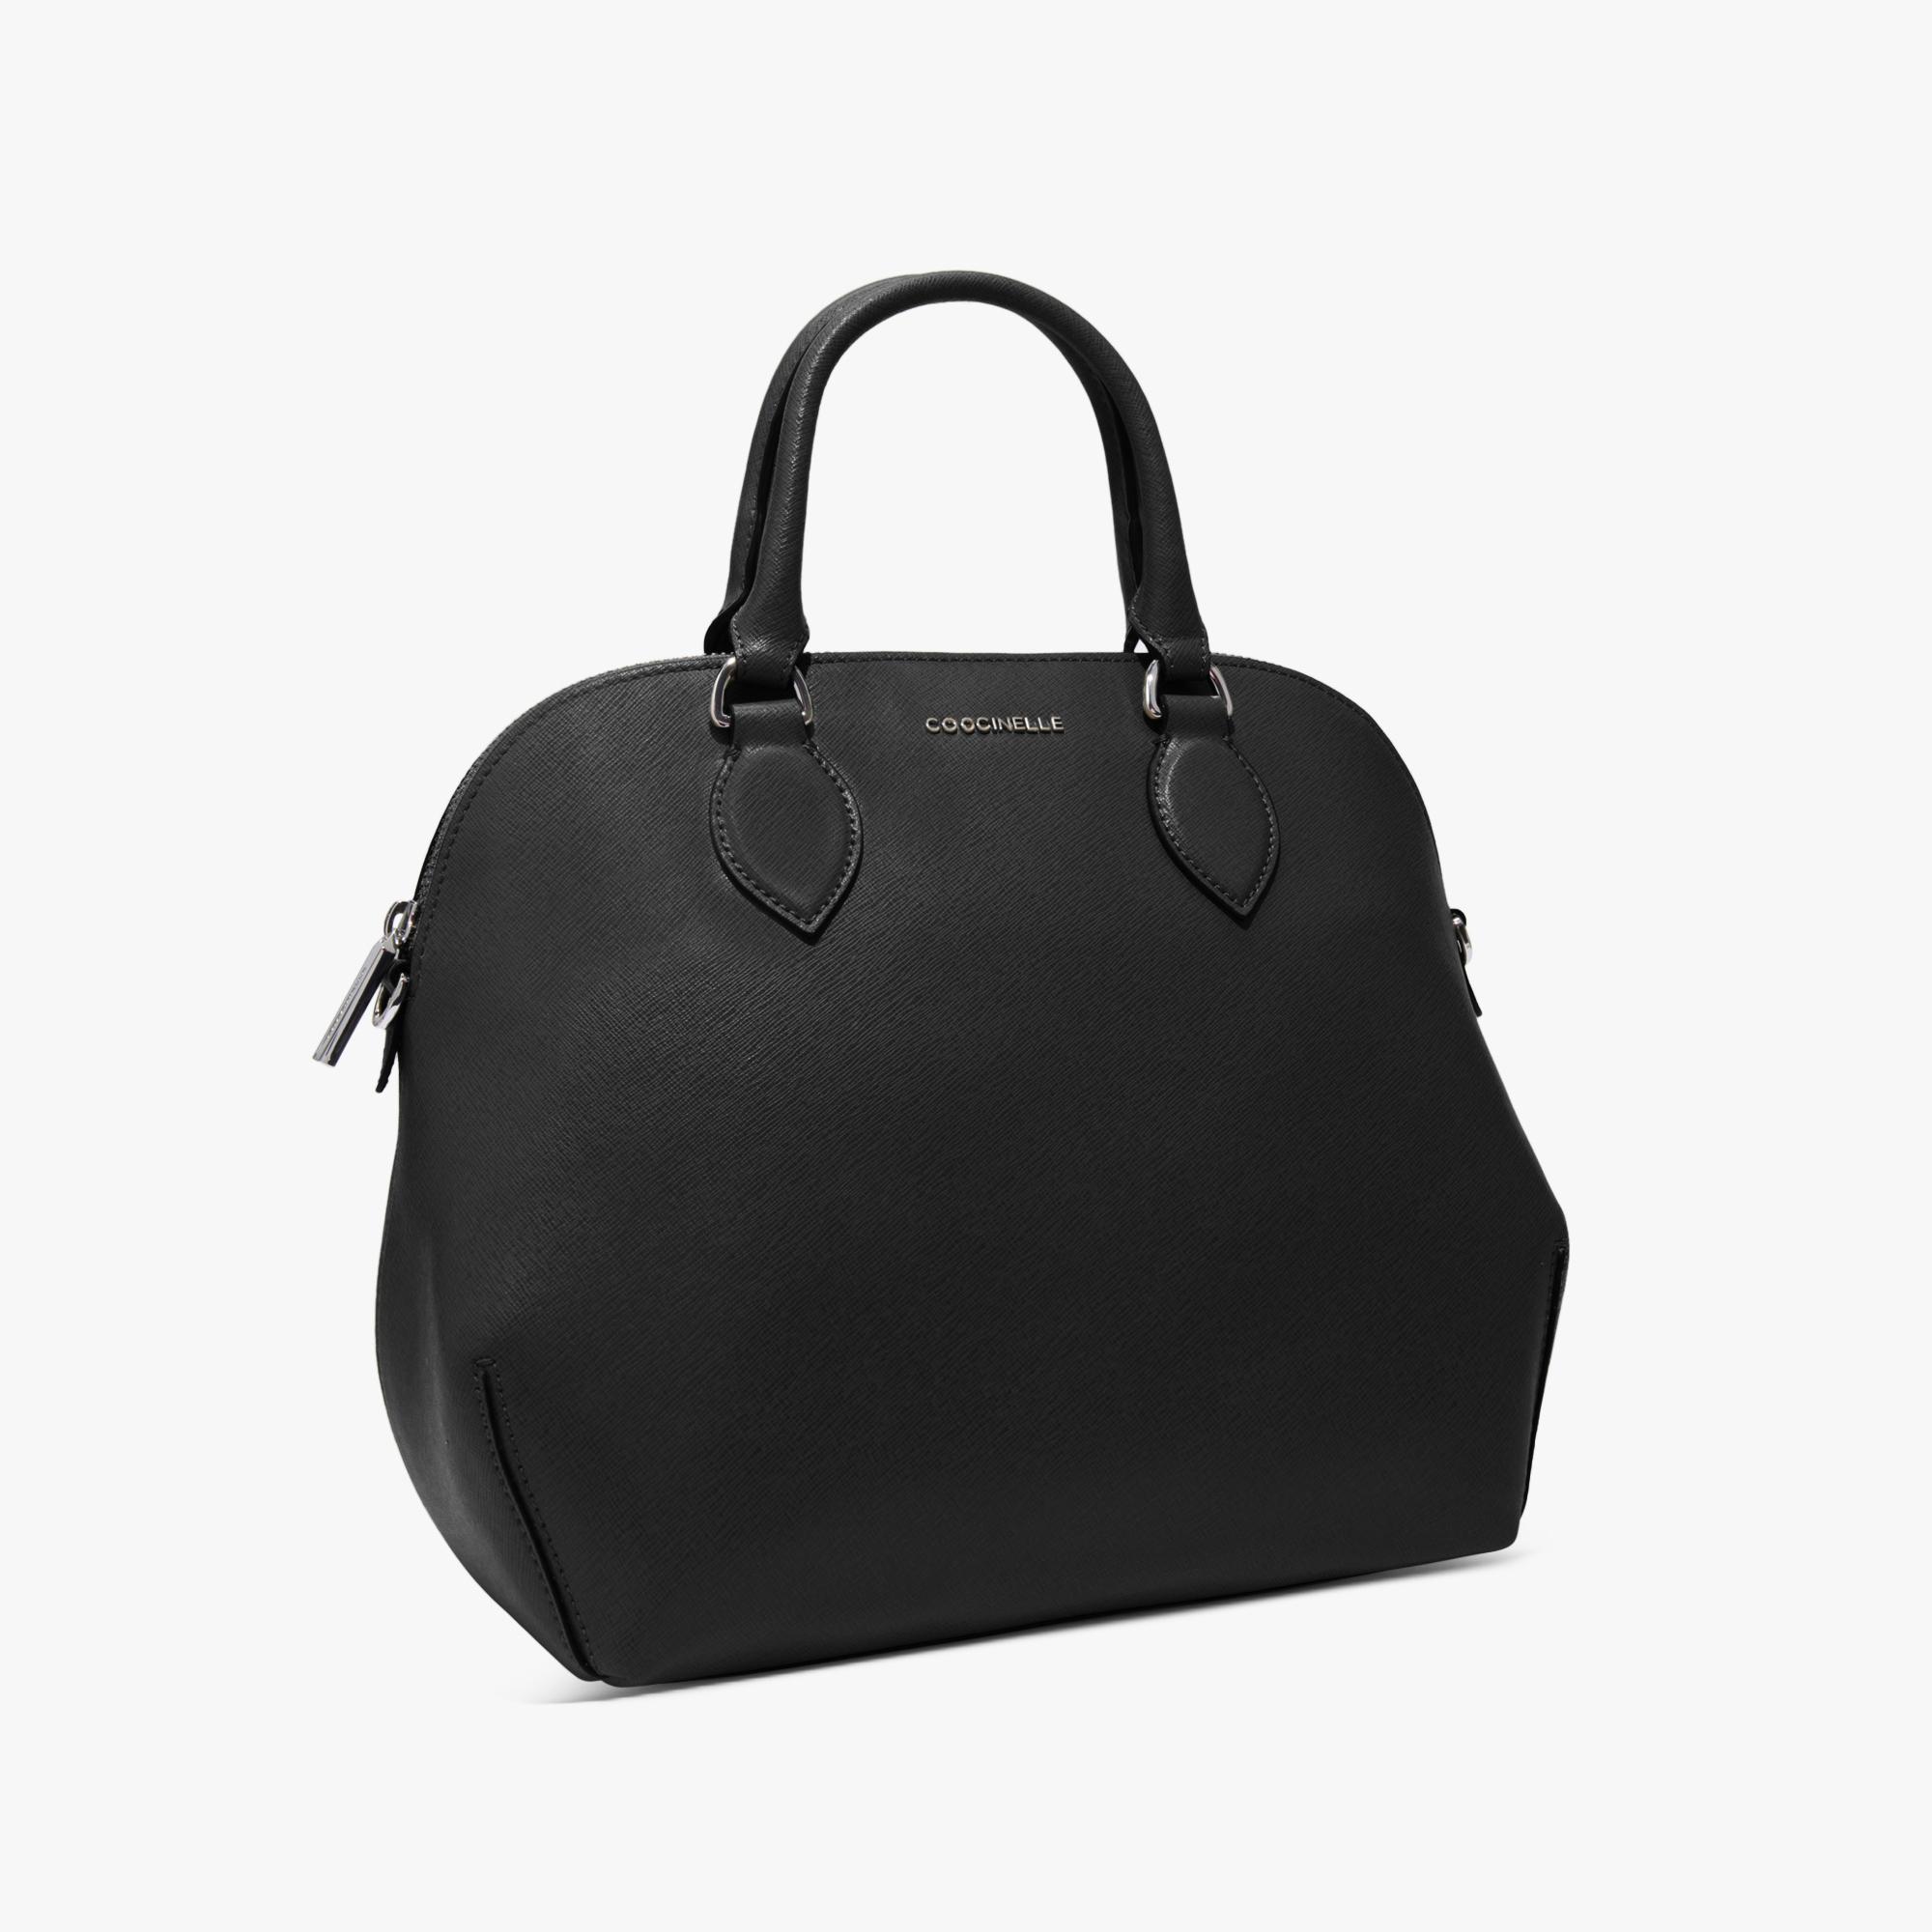 Yamilet Saffiano leather handbag